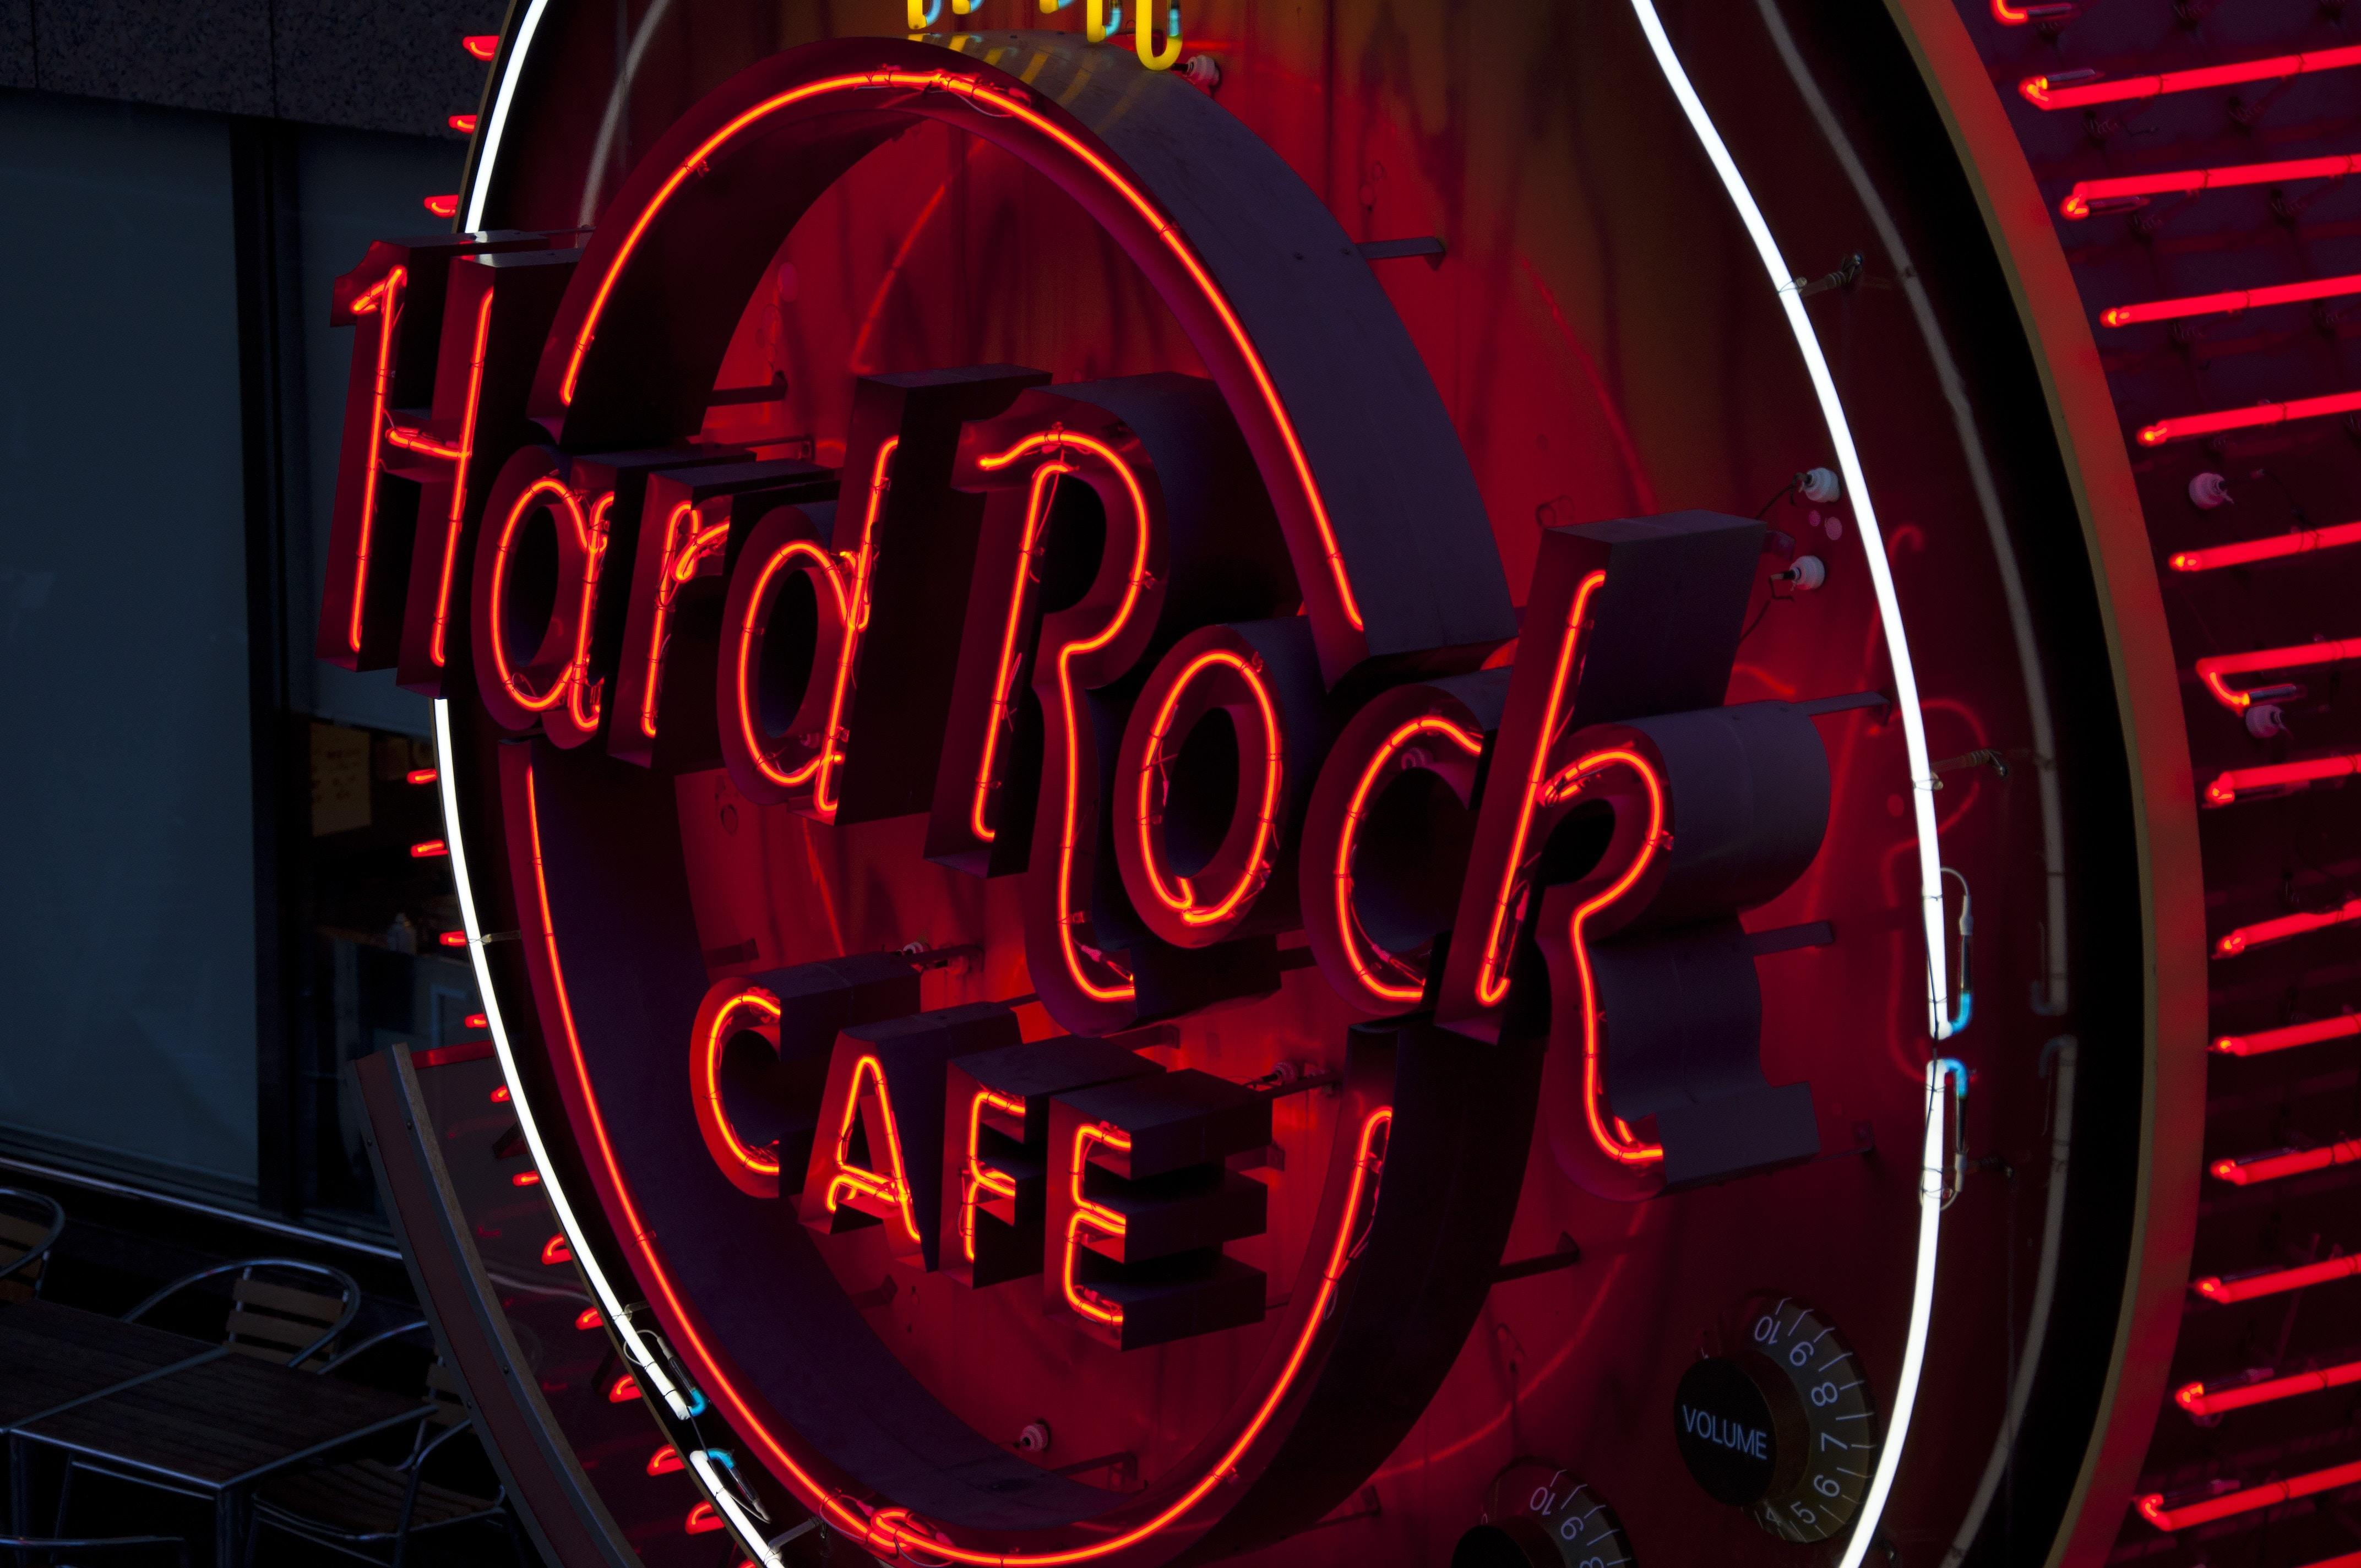 round red hard Rock Cafe signage